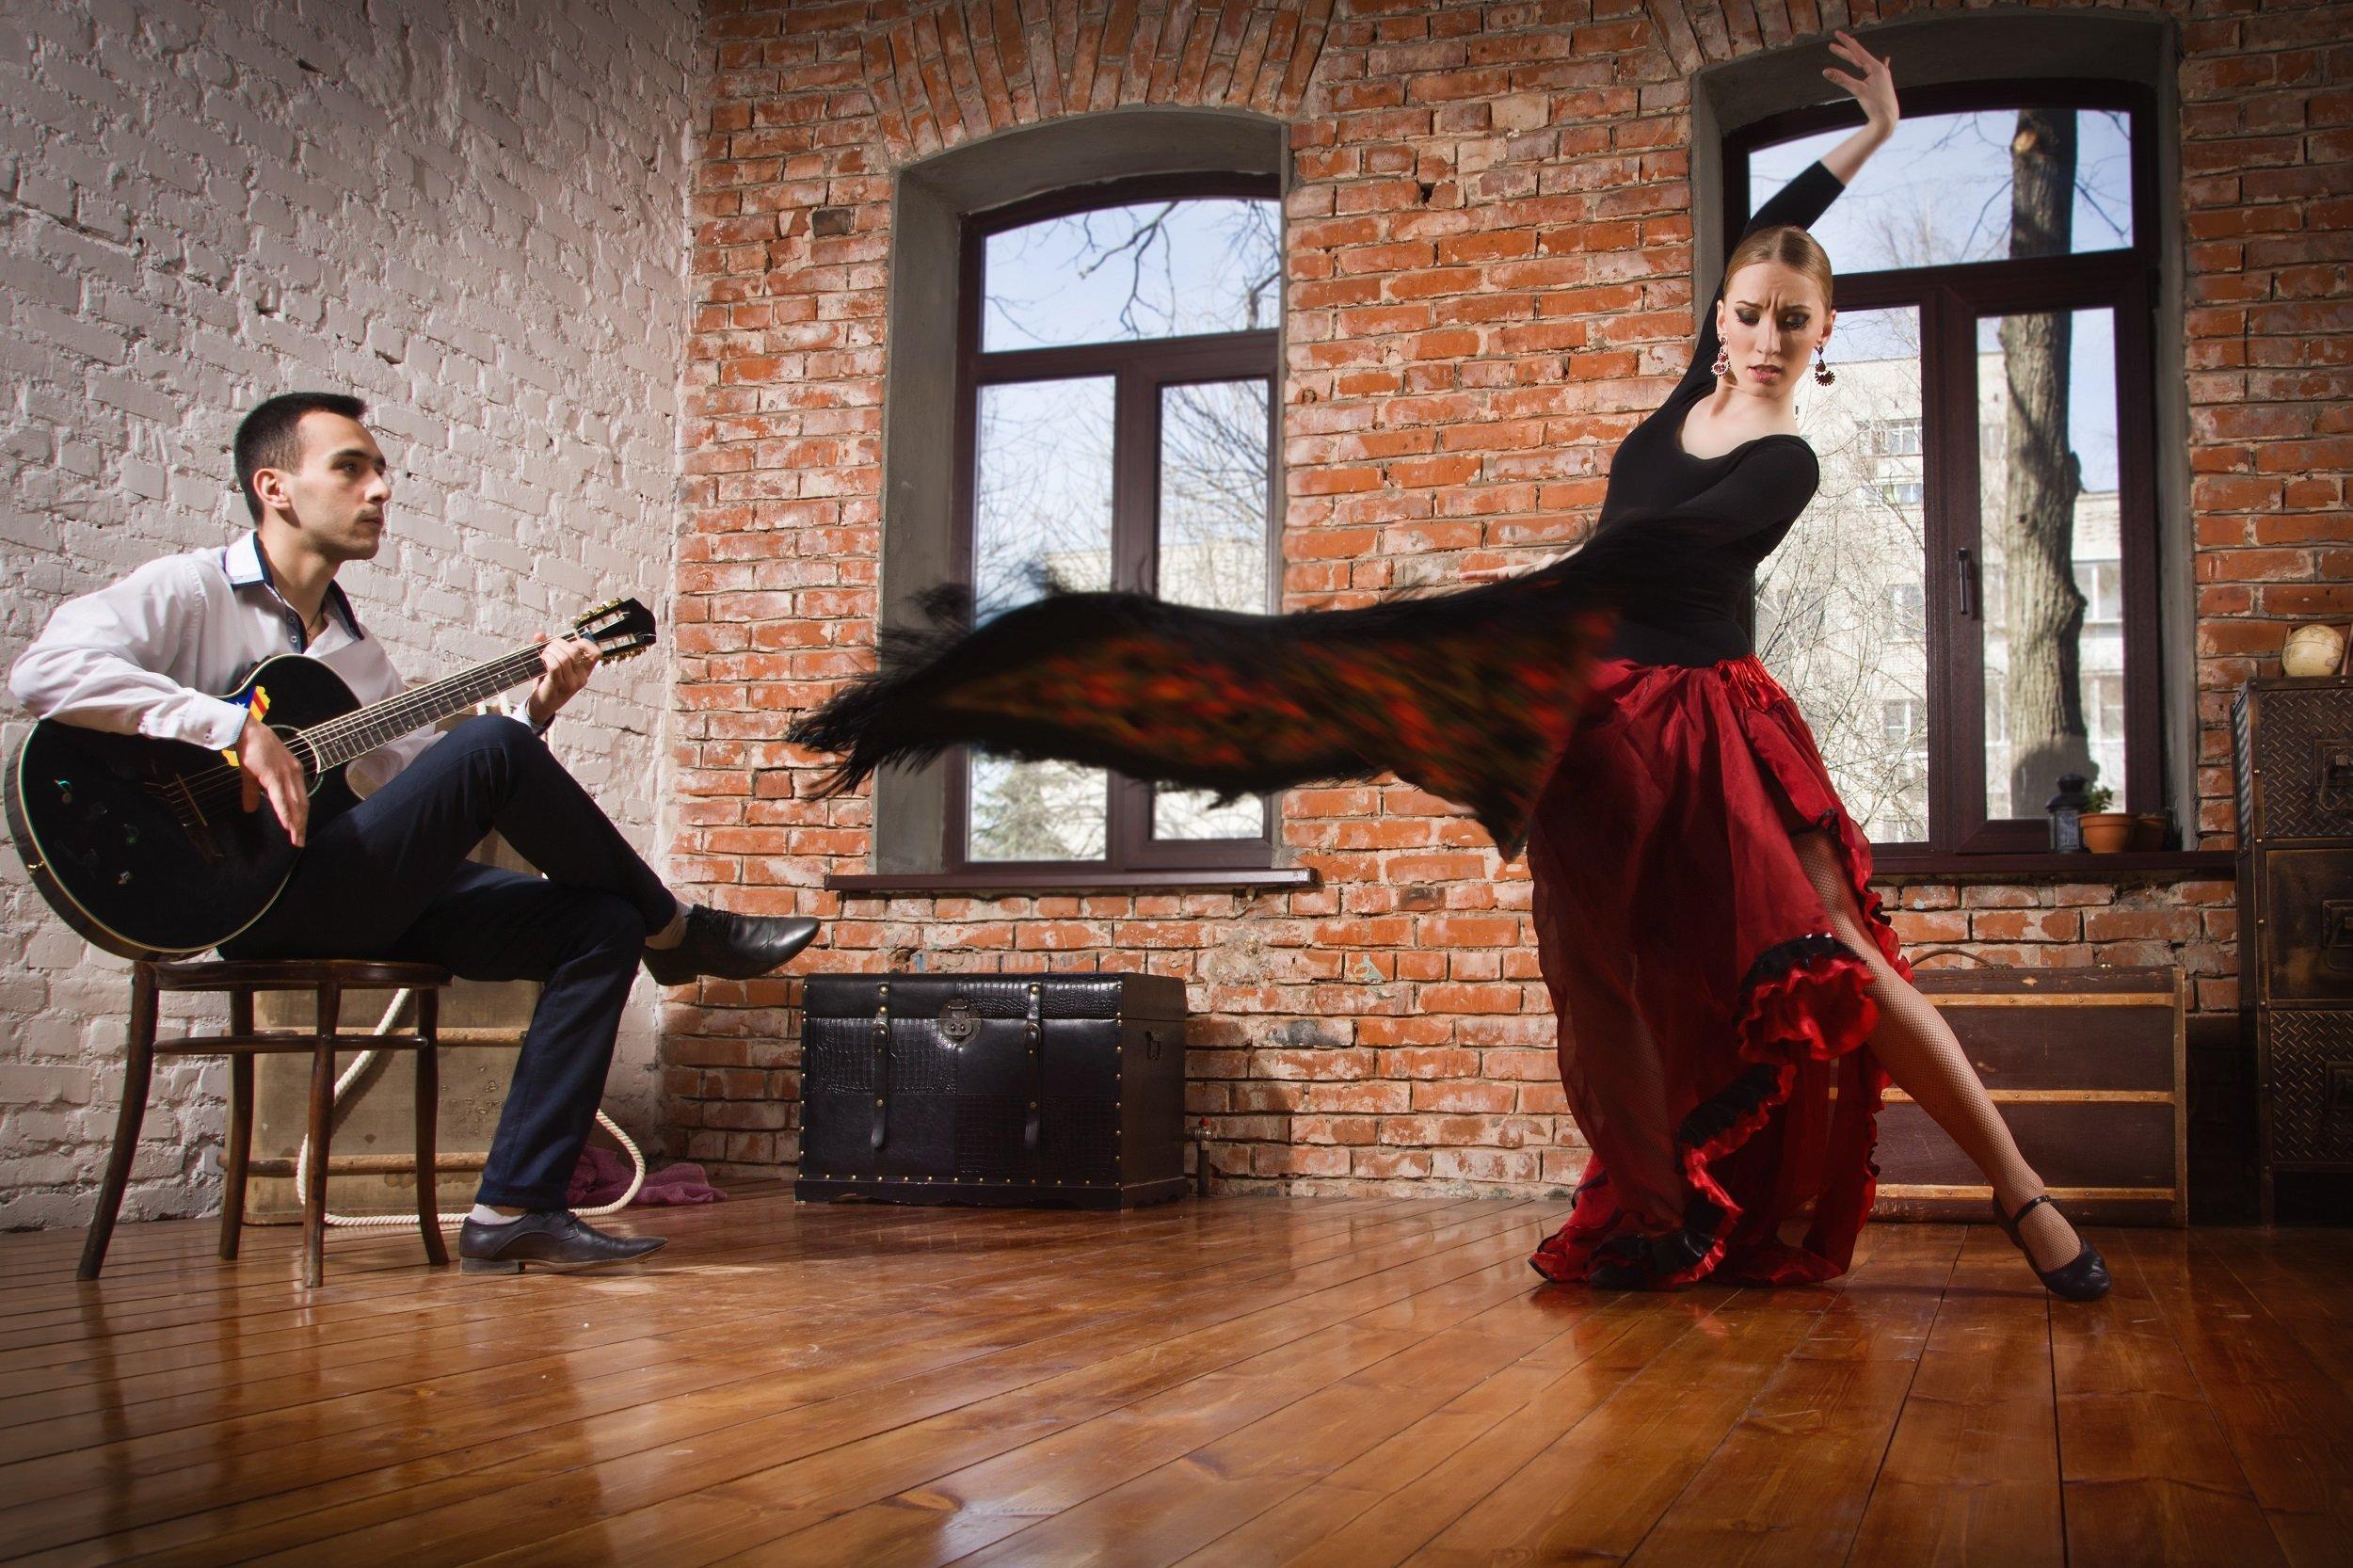 Flamenco On The Seville, Gibraltar & Granada 7 Day Tour Package